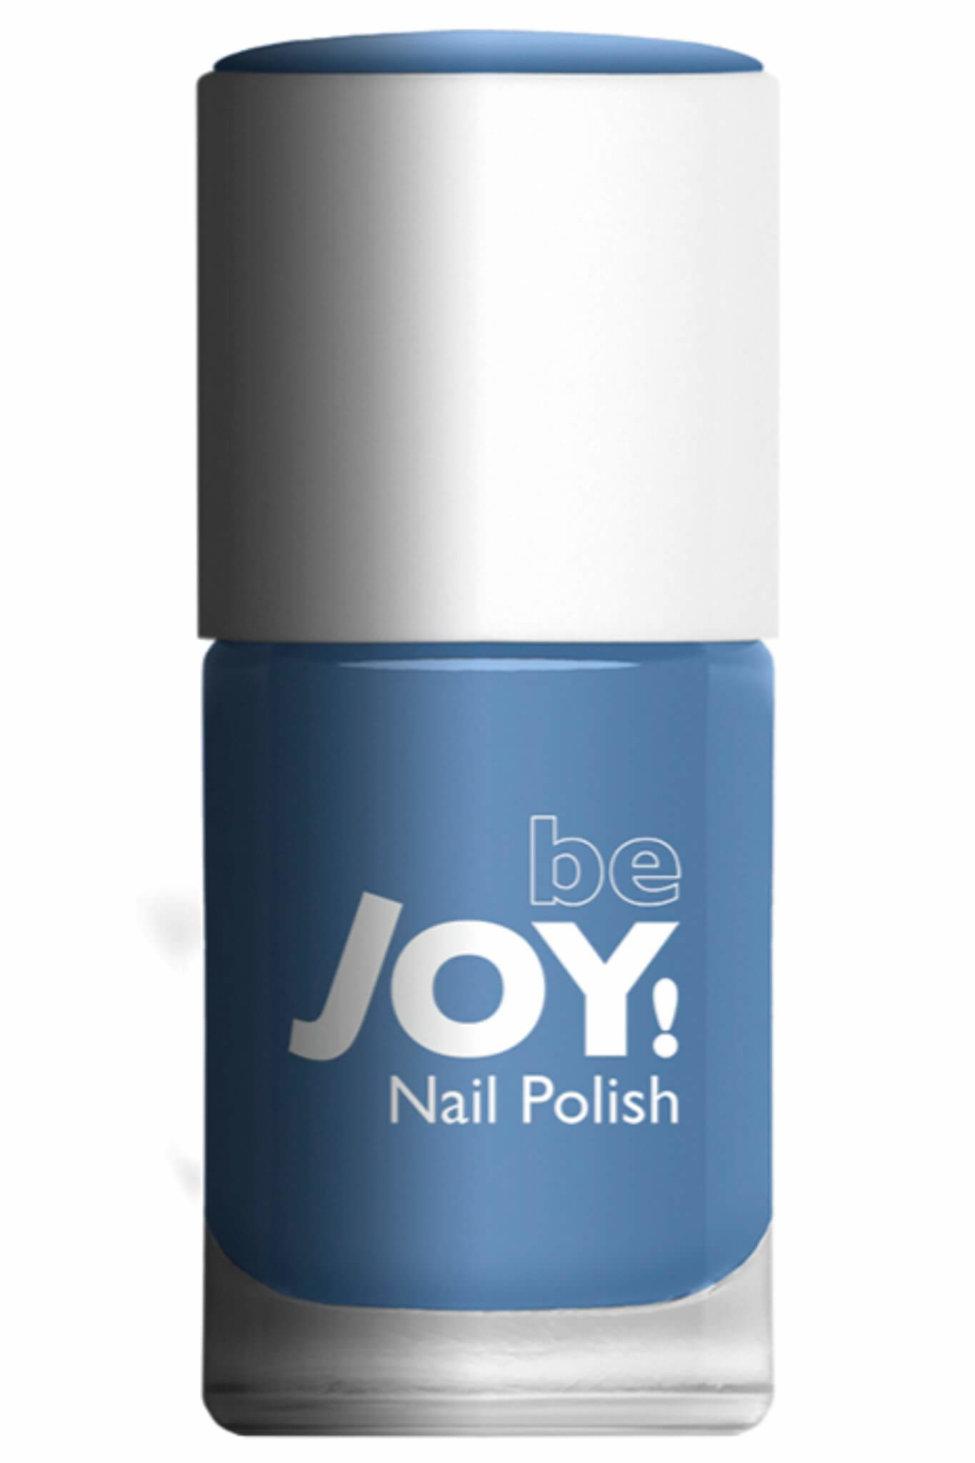 Be joy nail polish σιελ